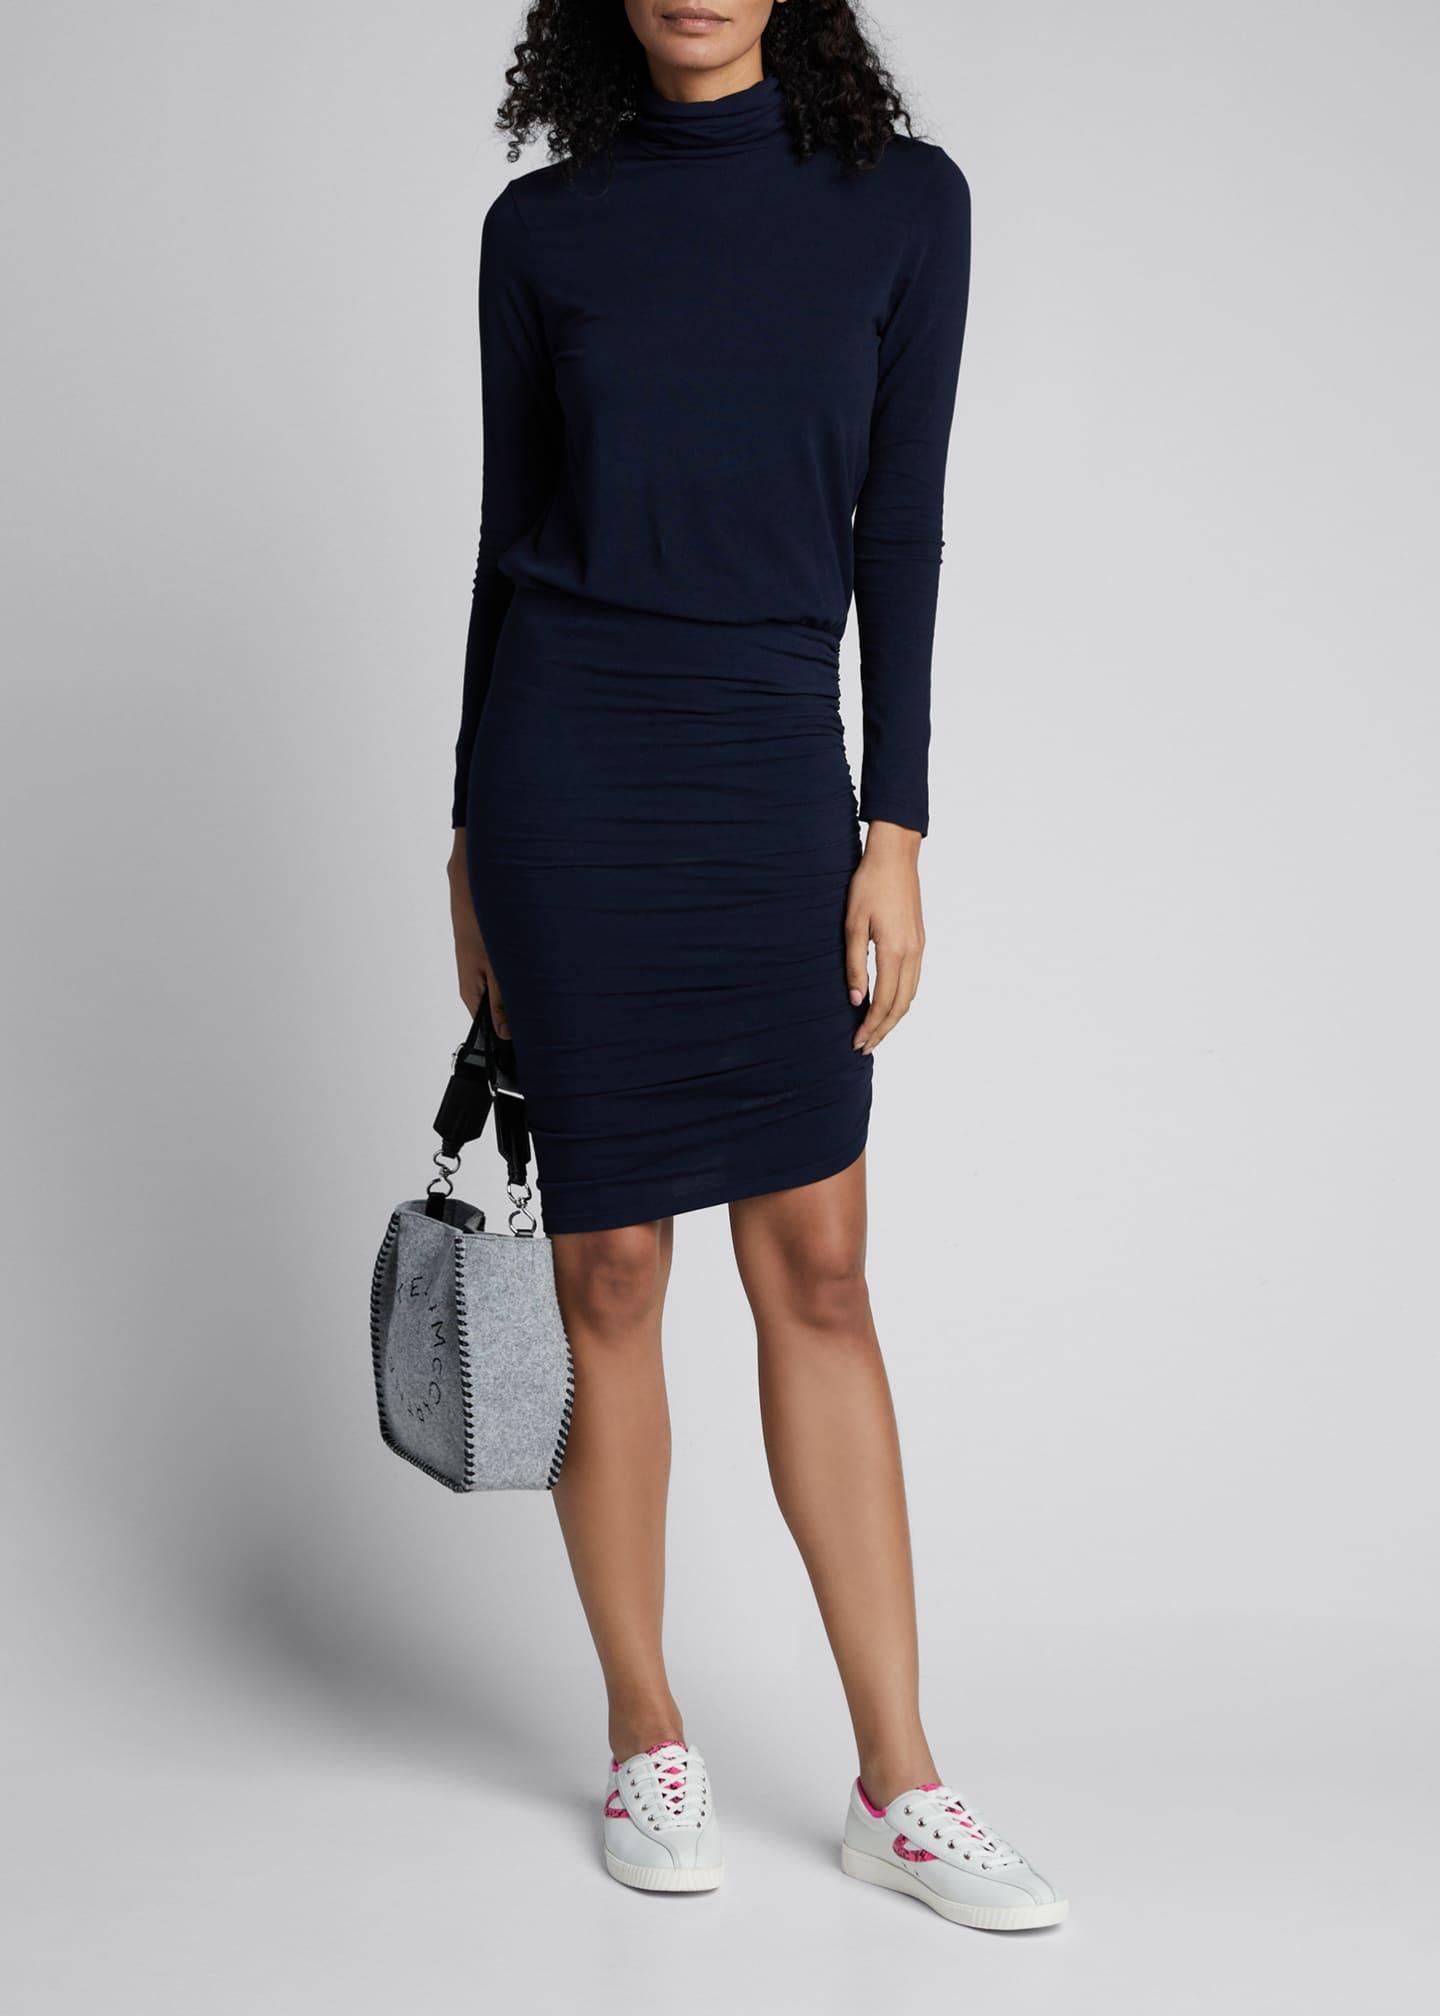 Sundry Turtleneck Long-Sleeve Blouson Dress